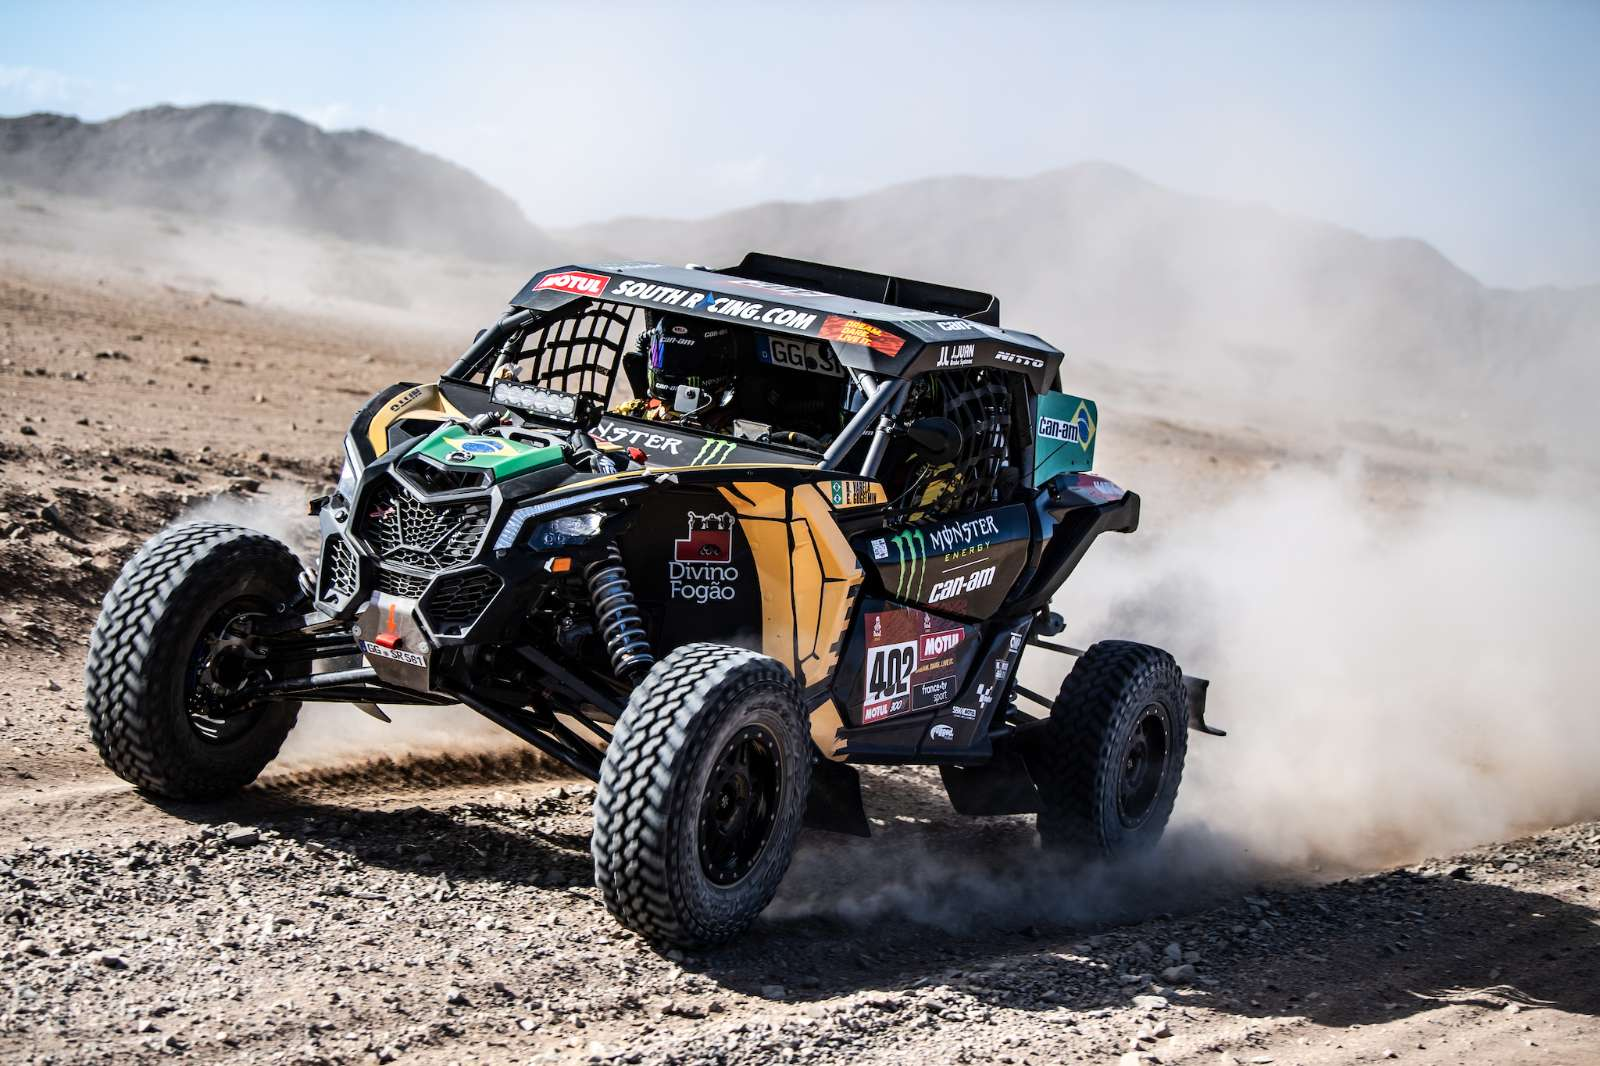 Brasileiros completam segundo dia no top 10 dos UTVs no Rally Dakar 2020